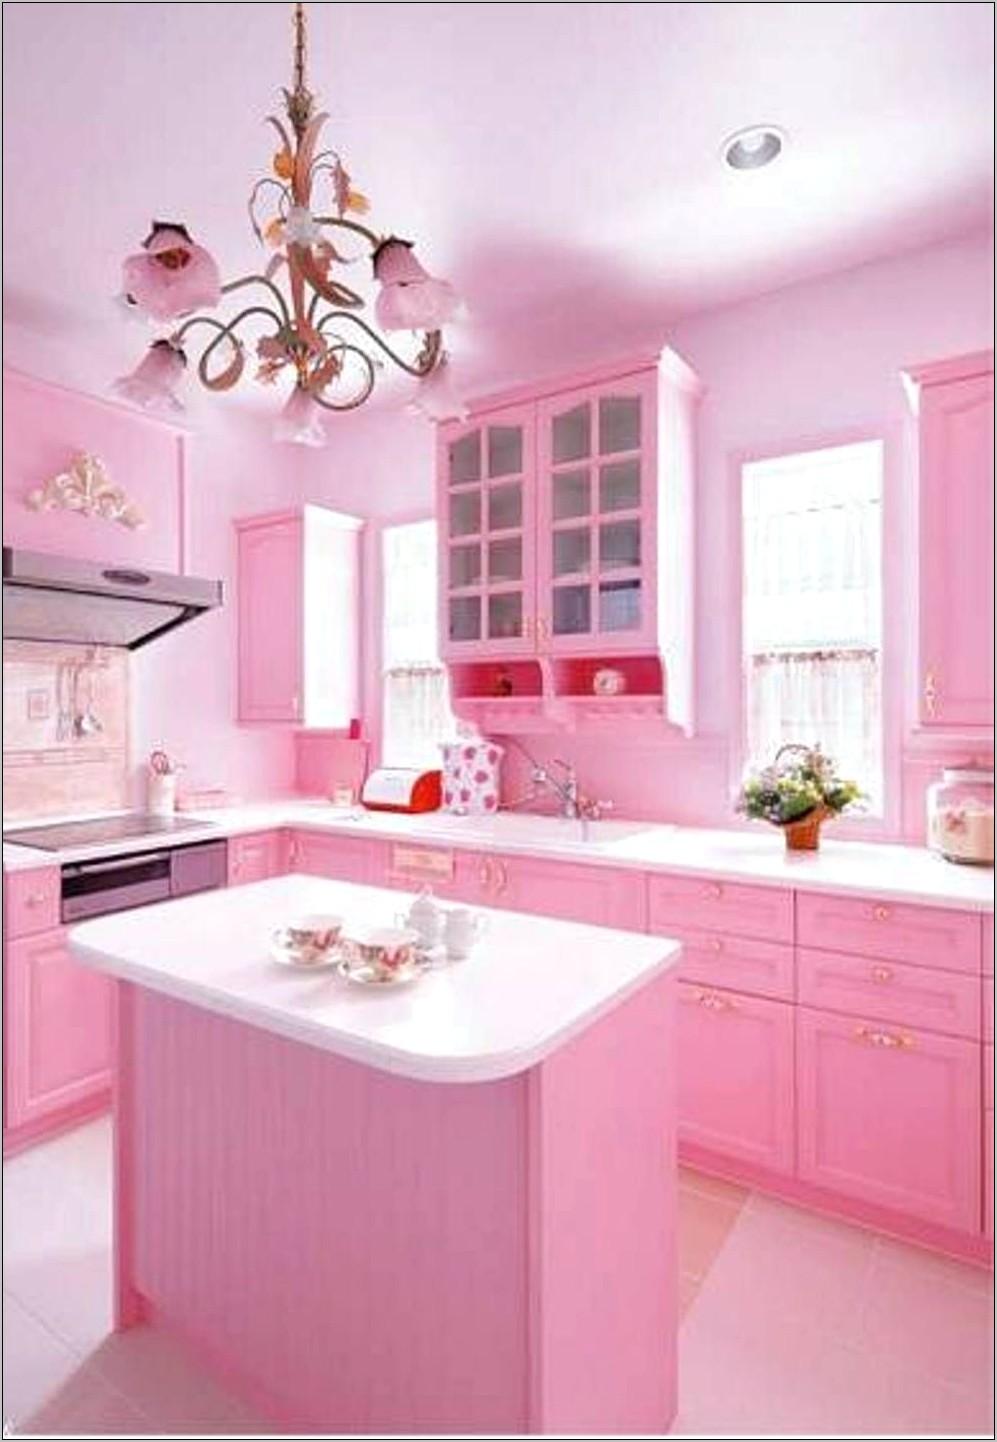 Girly Kitchen Decorating Ideas